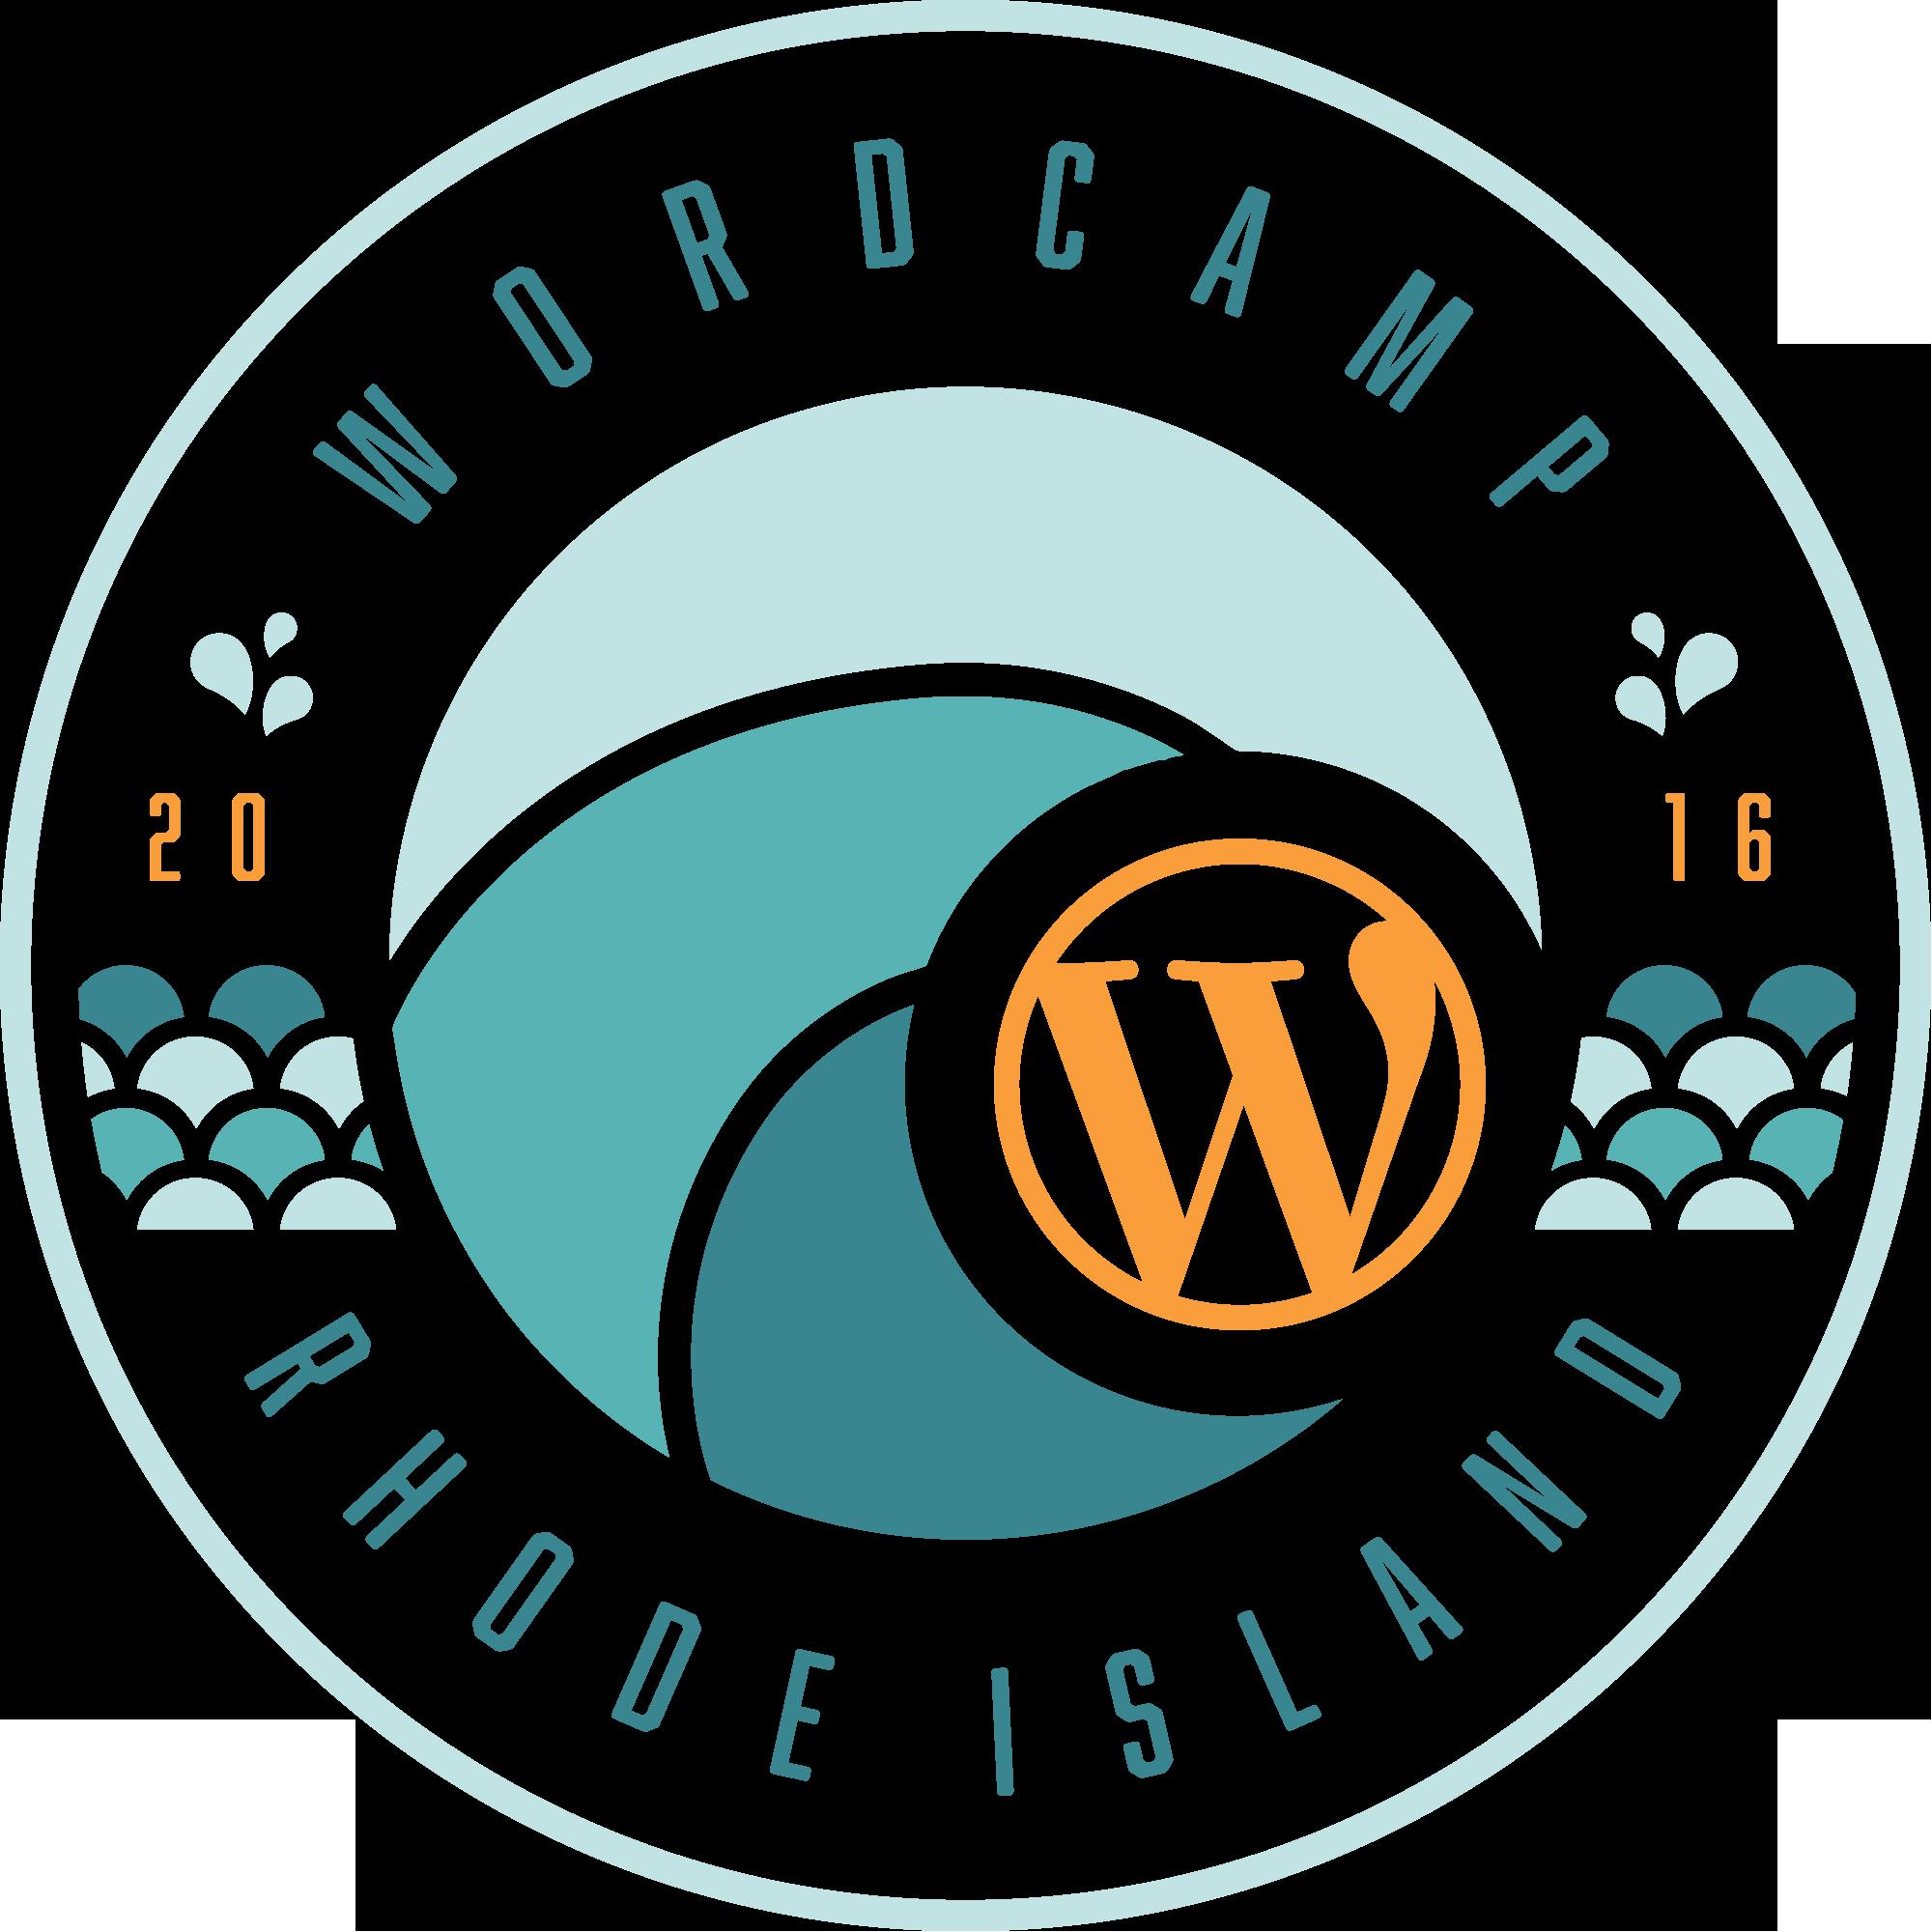 2016 WordCamp Rhode Island logo